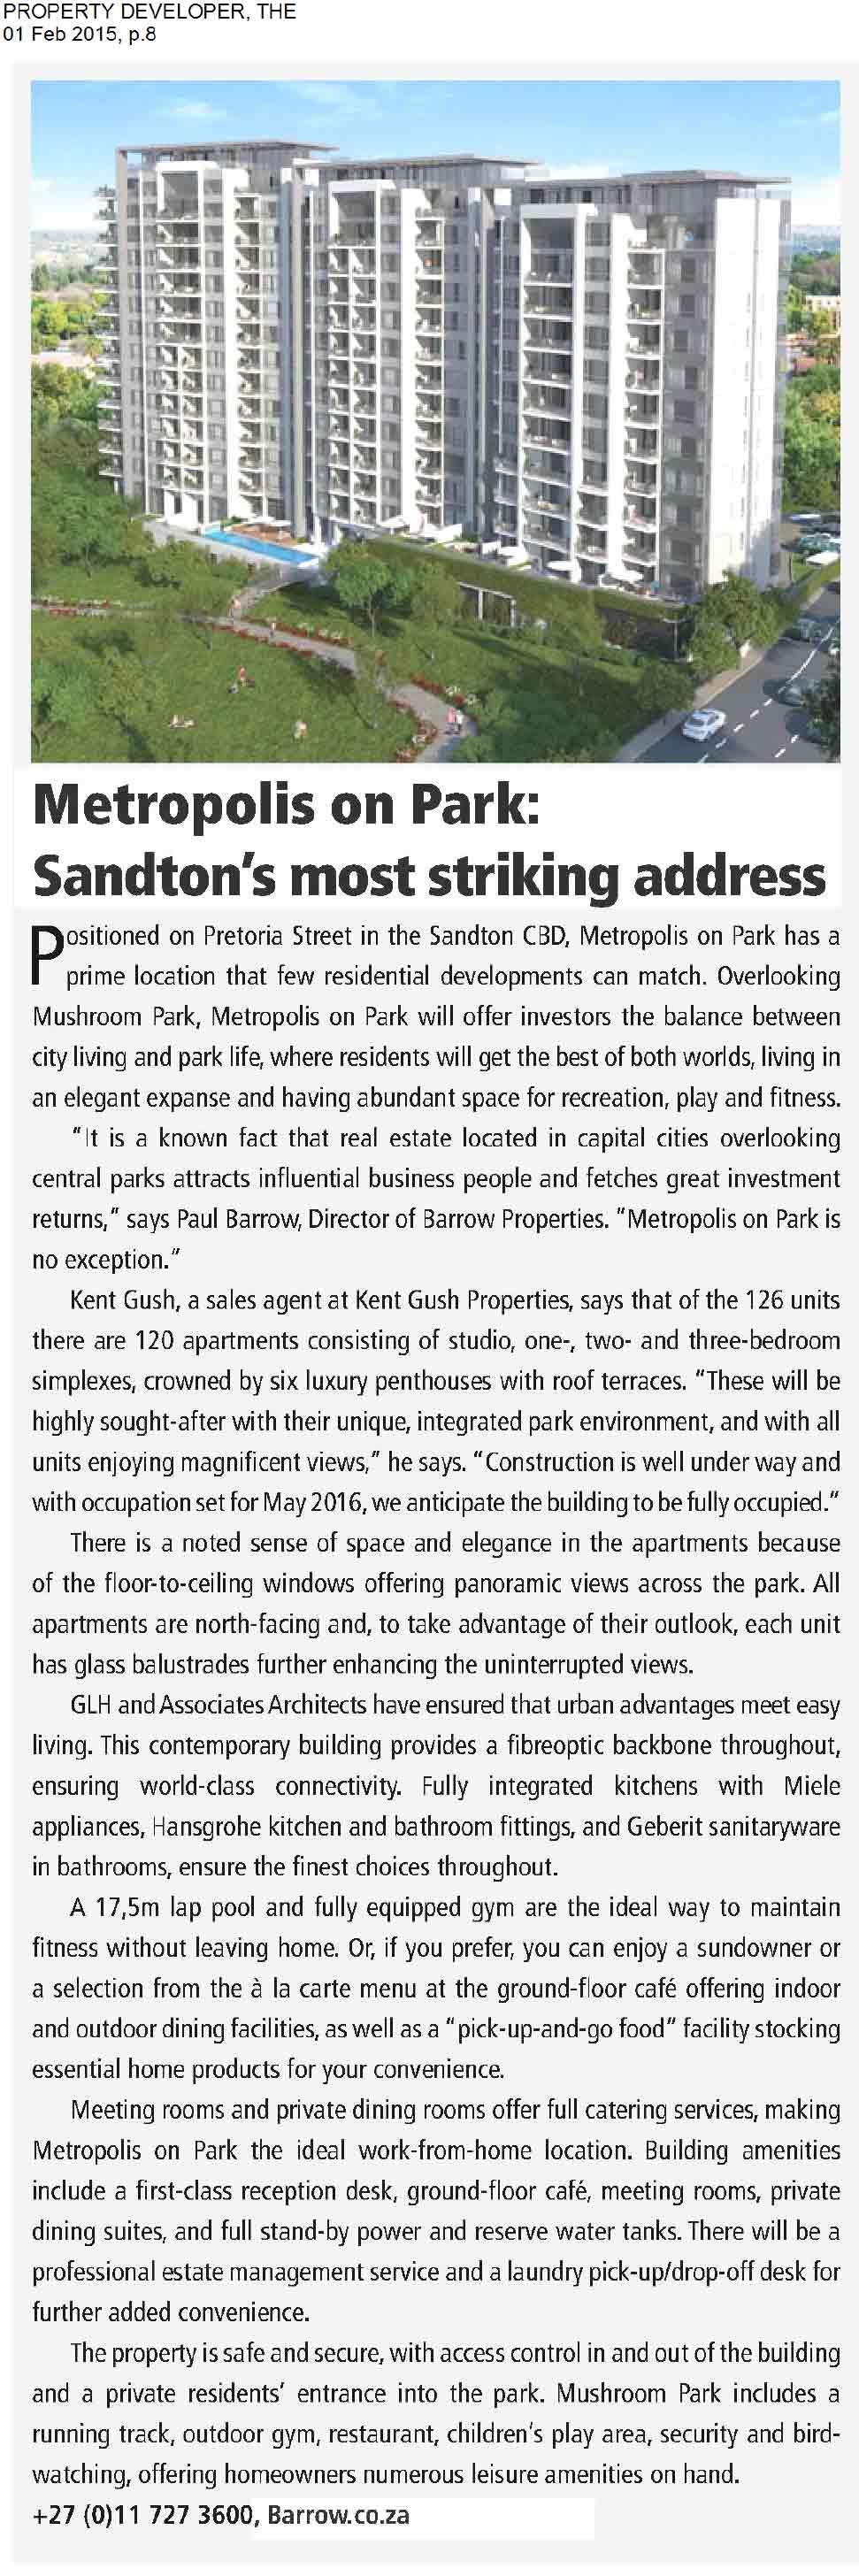 Metropolis-on-Park-Sandton's-most-striking-address